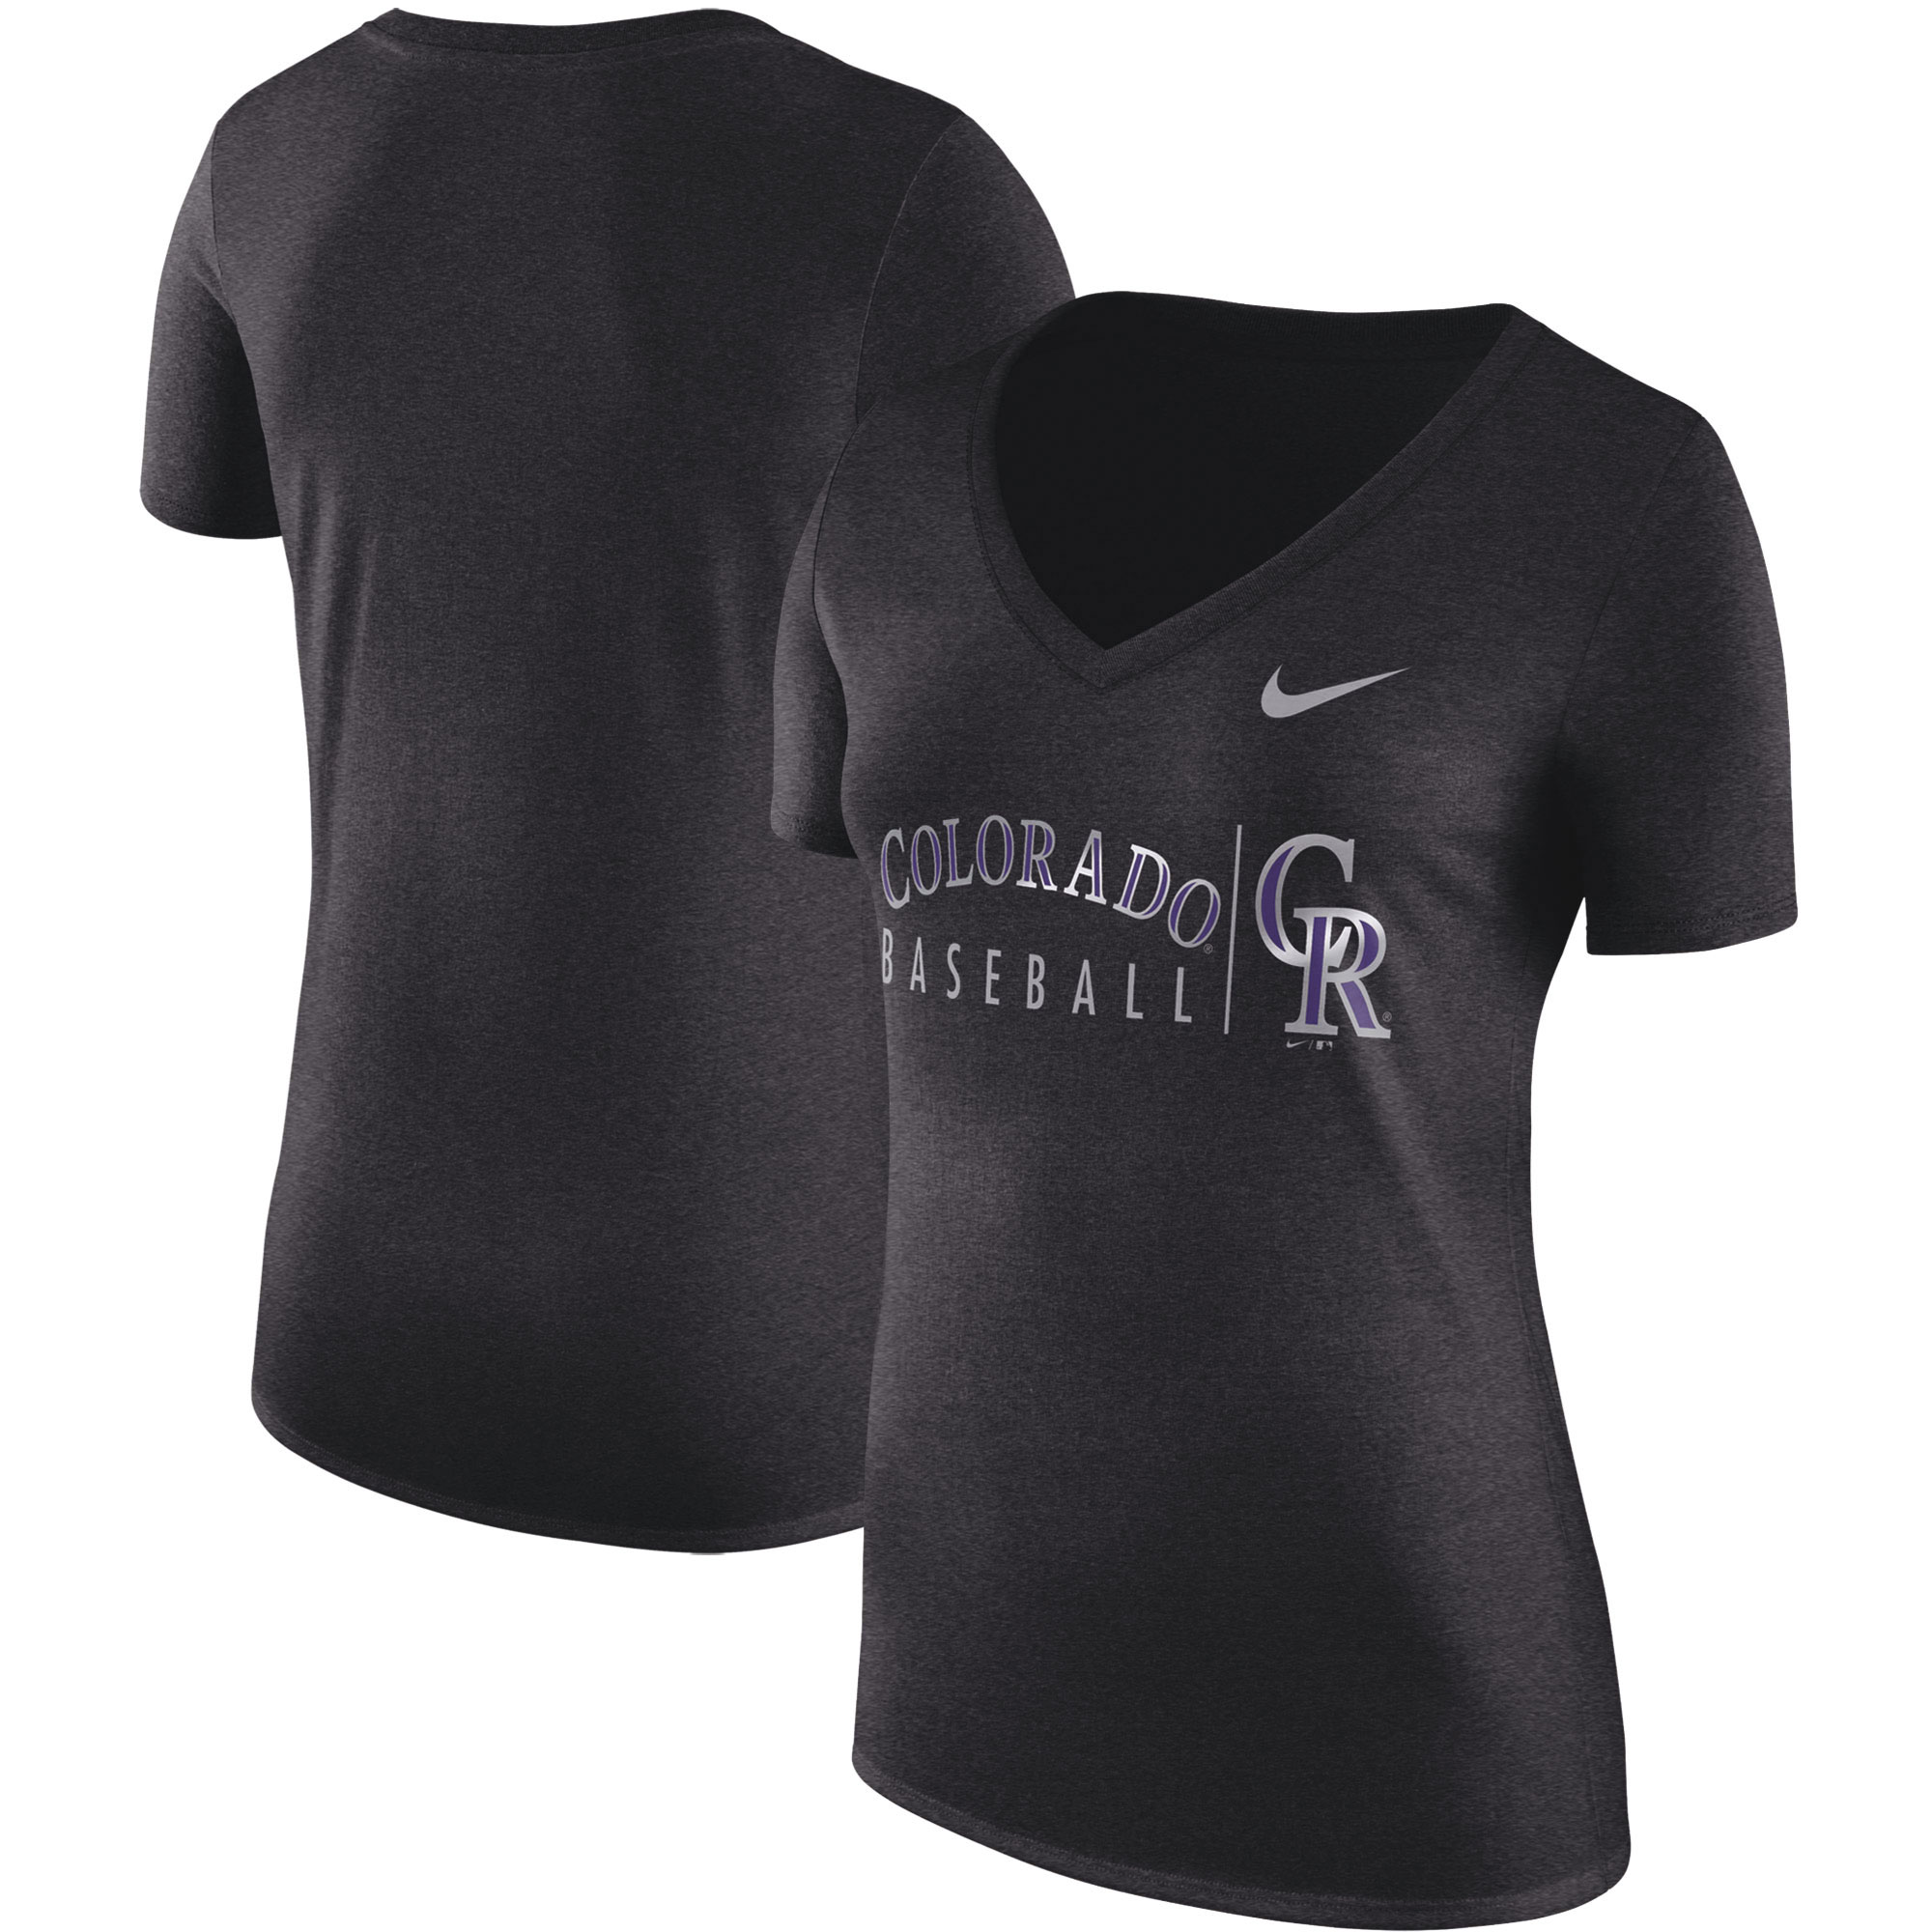 Colorado Rockies Nike Women's Tri-Blend Practice T-Shirt - Black